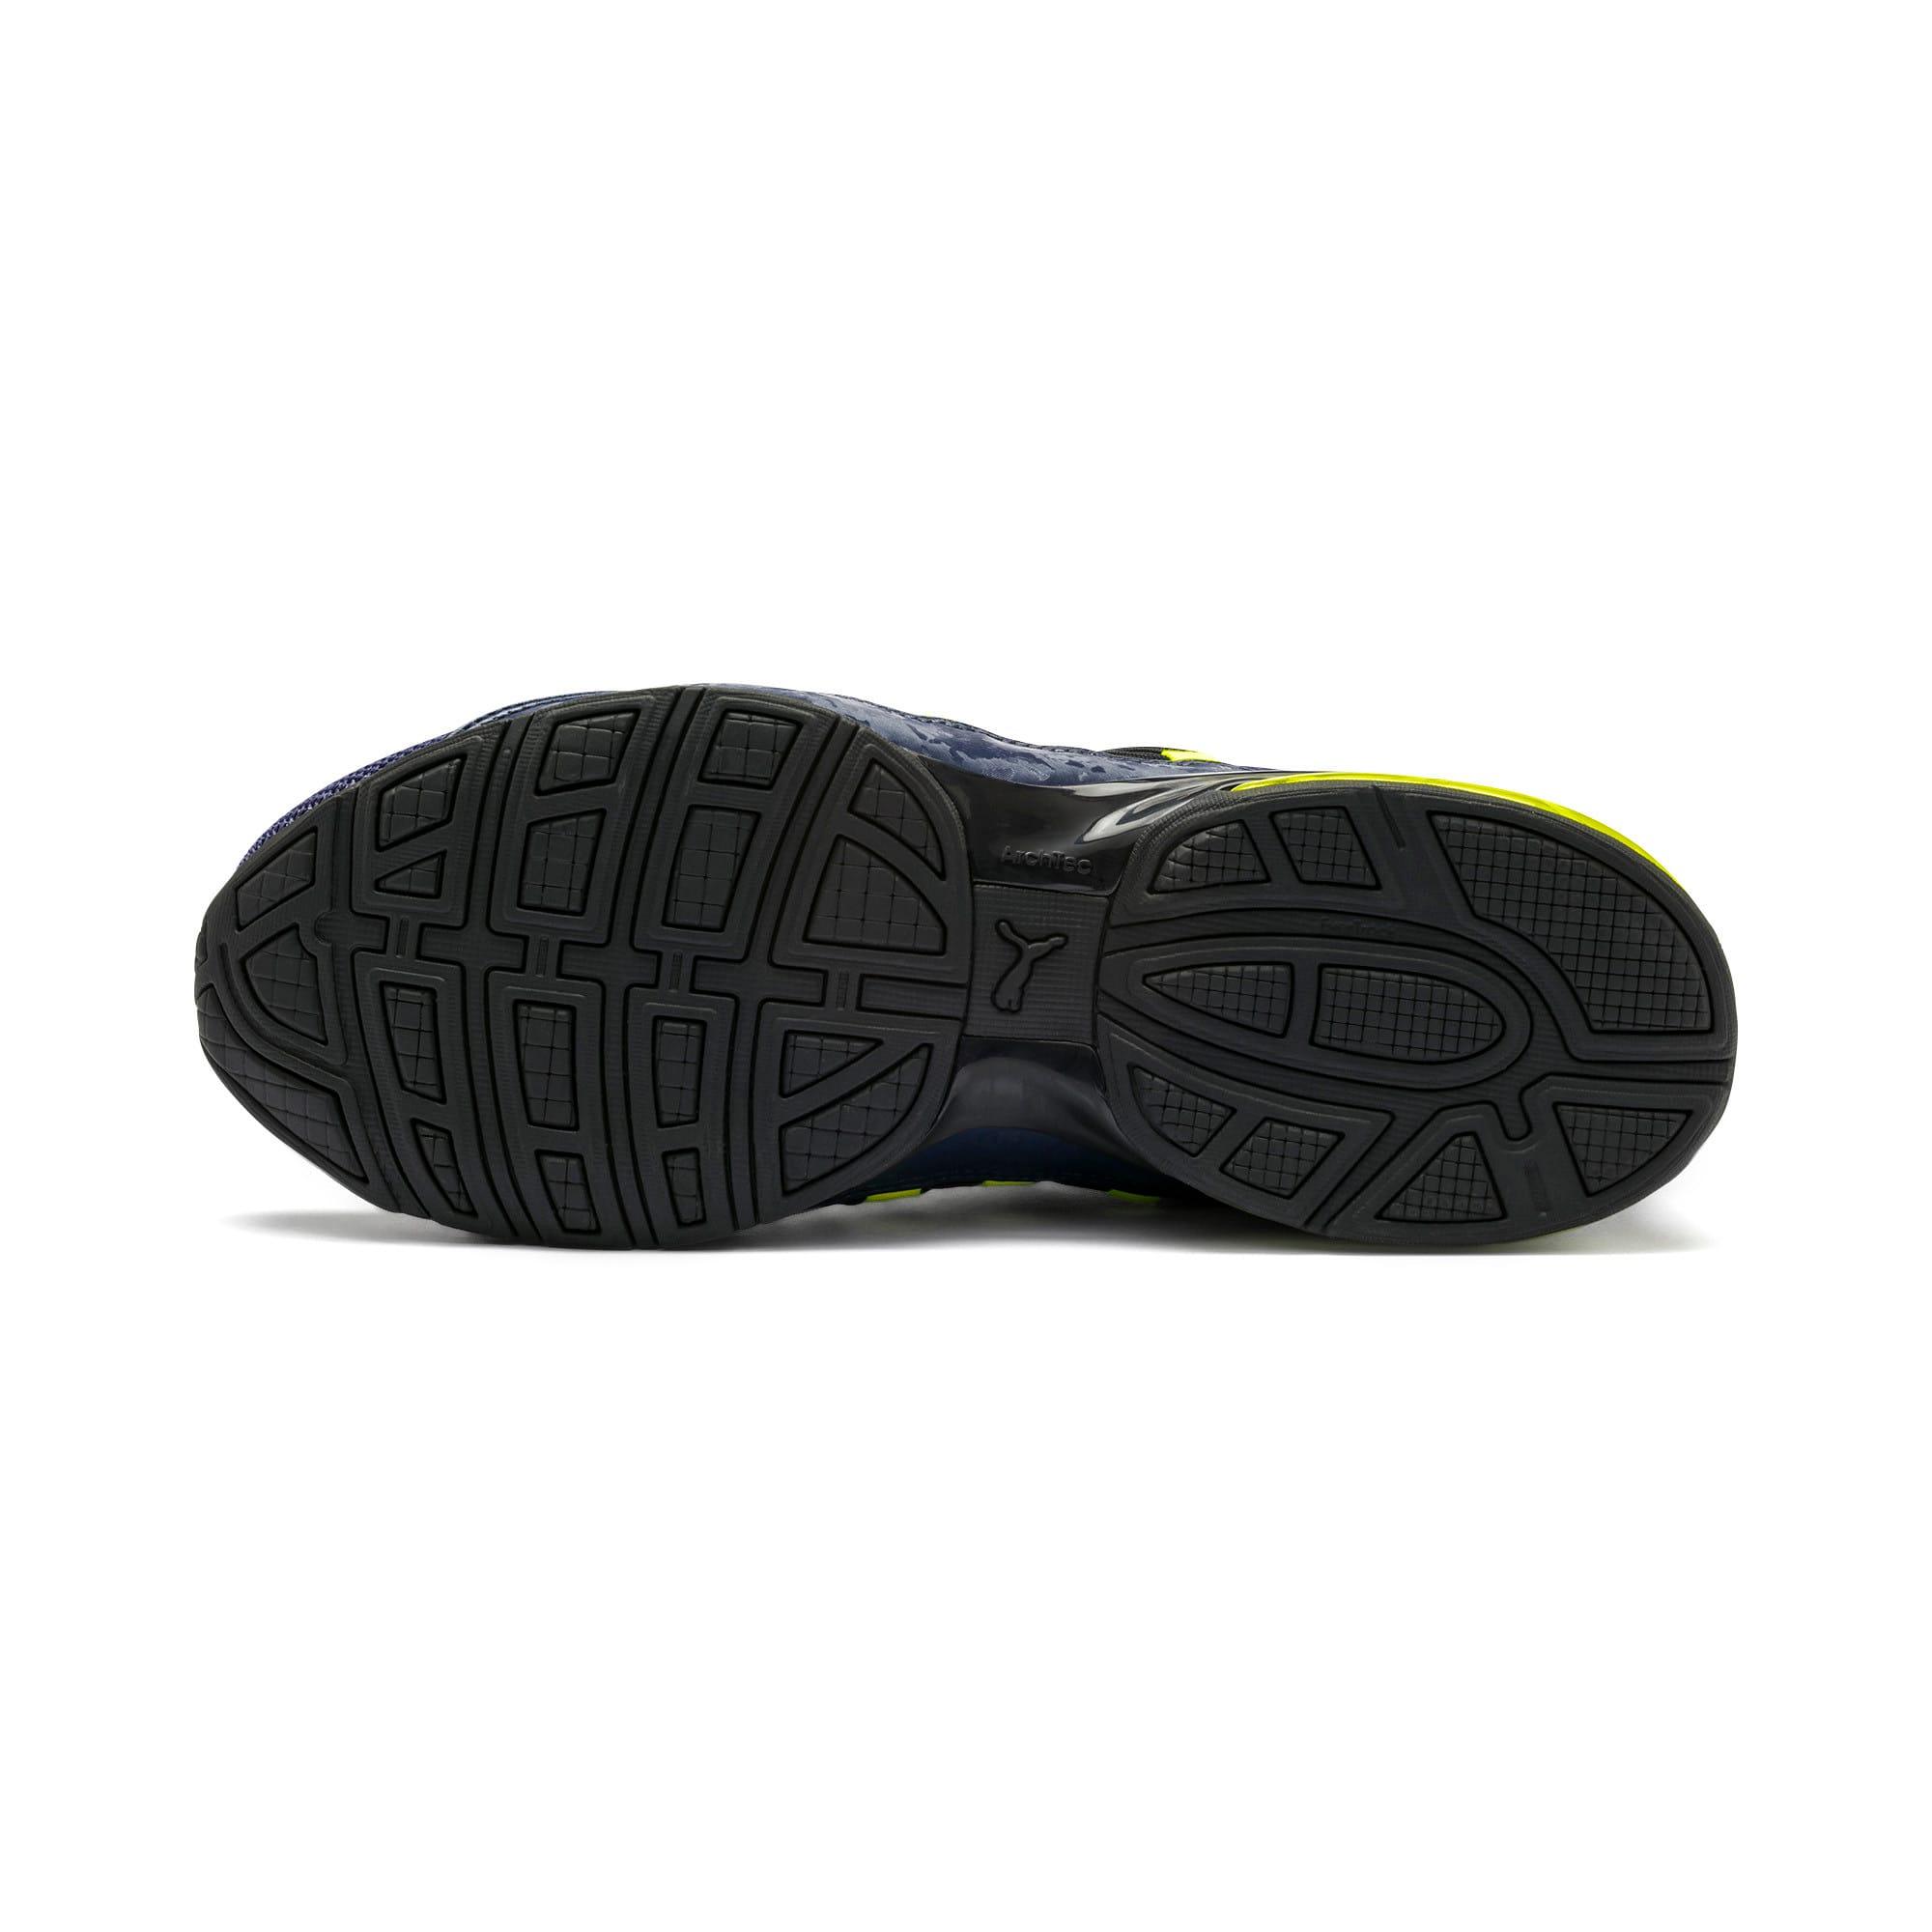 Thumbnail 5 of CELL Regulate Camo Men's Training Shoes, Peacoat-Yellow Alert, medium